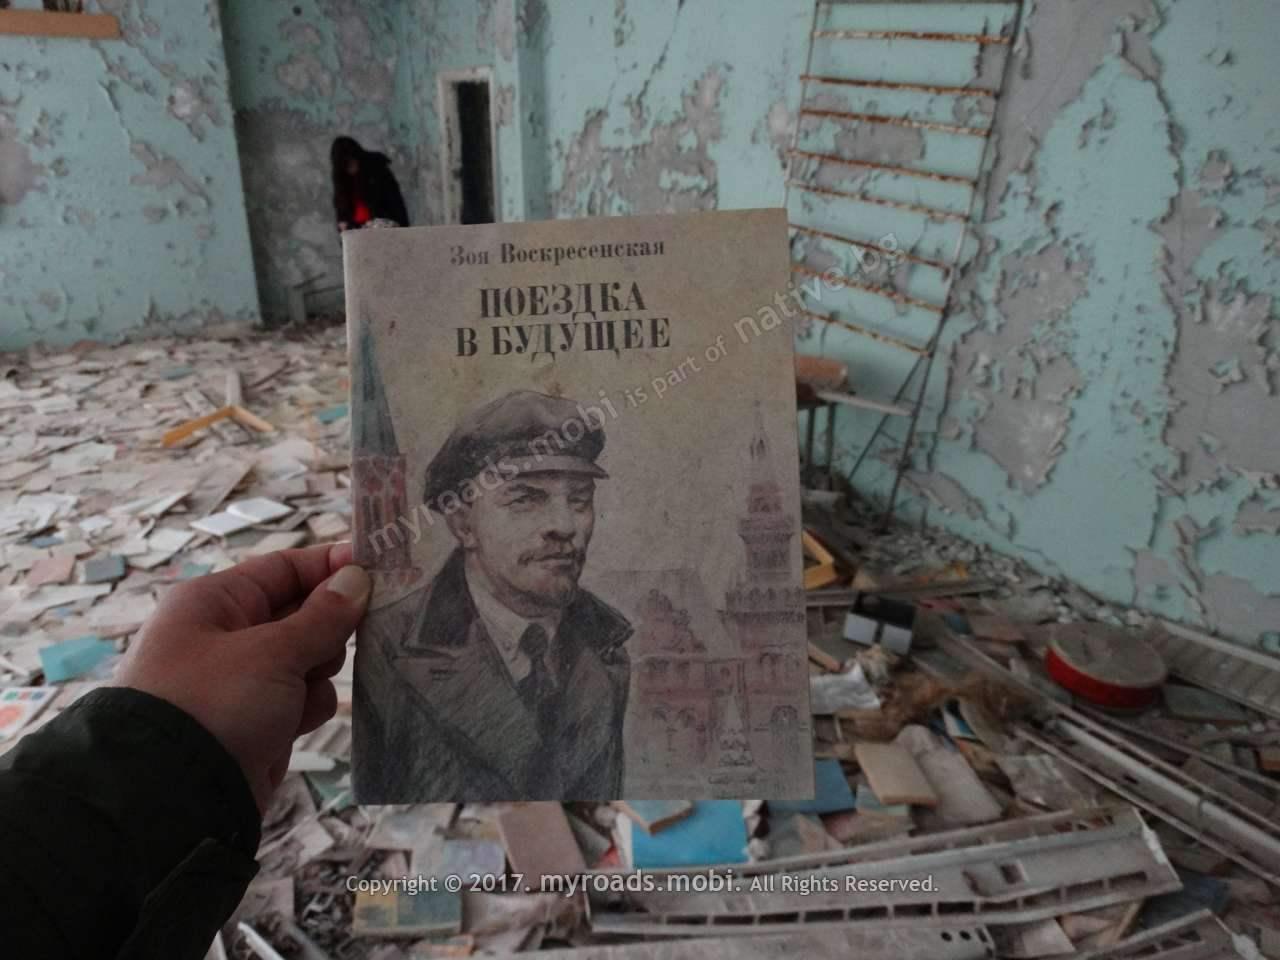 chernobil-pripyat-myroadsmobi-georgi-ivanov (1)